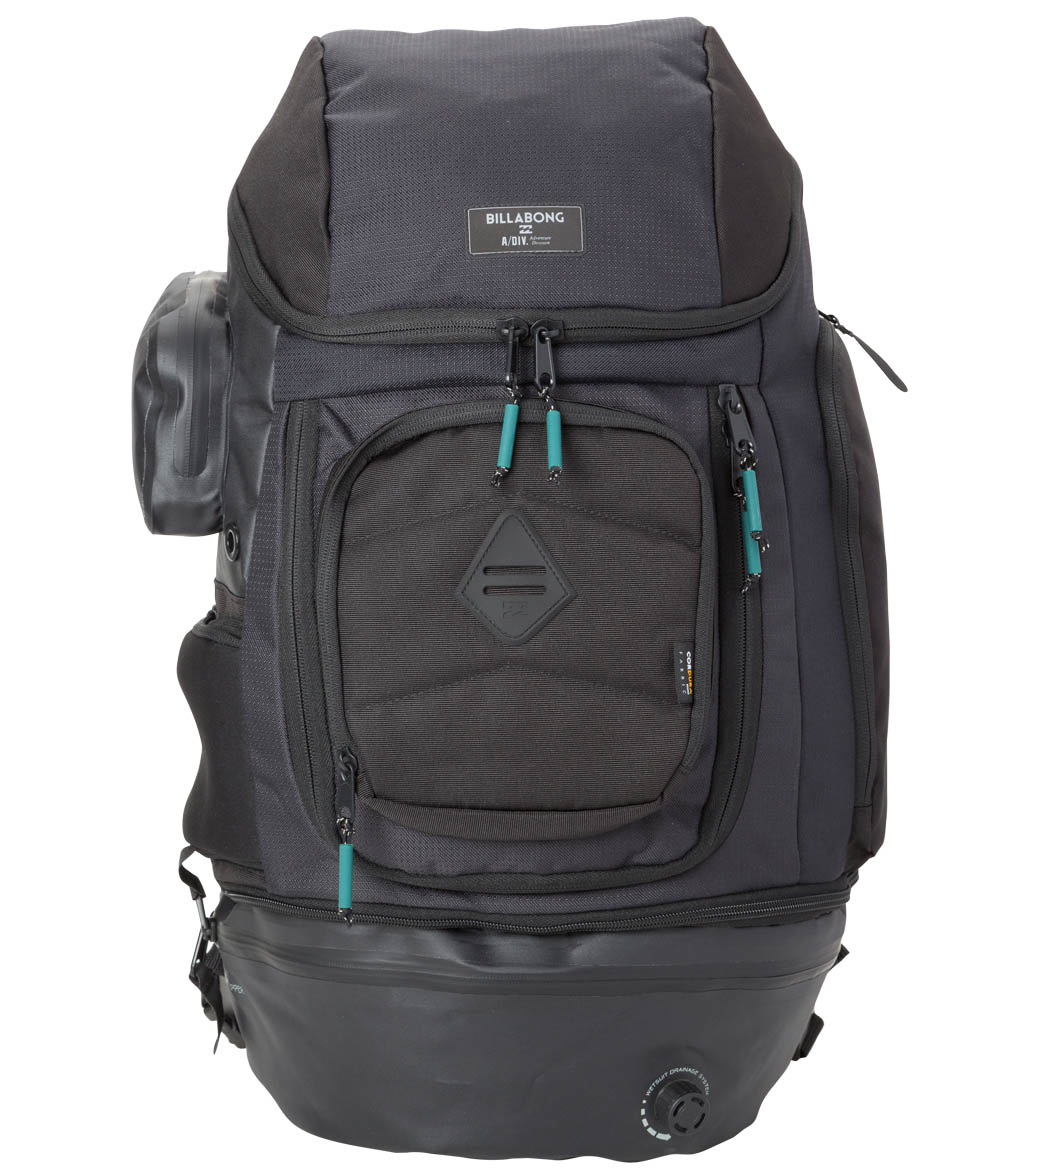 Billabong Men's Apex Boa Backpack at SwimOutlet.com - Free Shipping